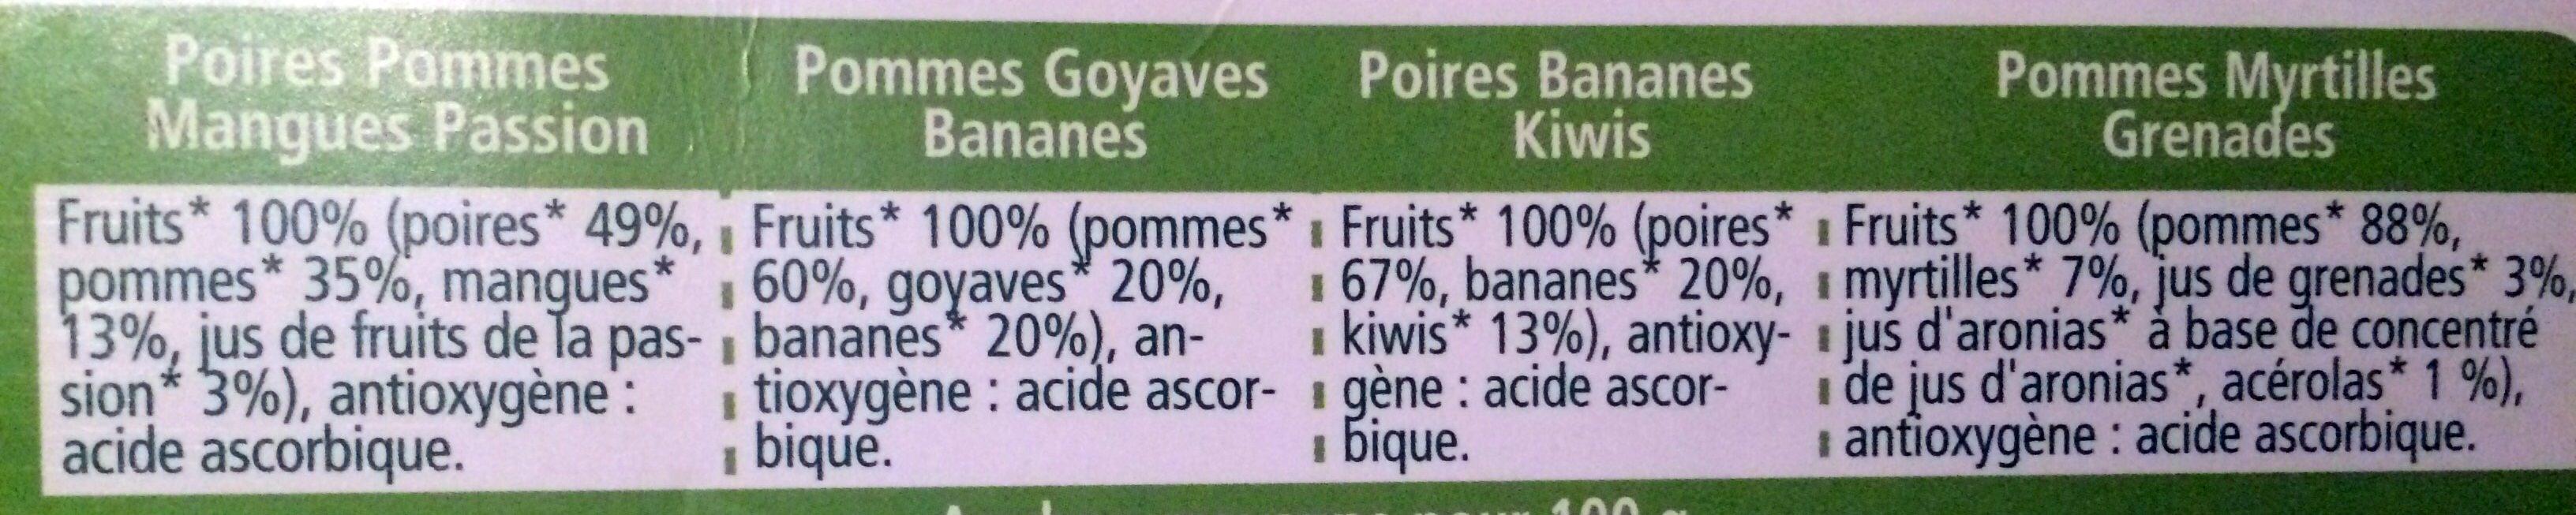 100% Fruits Multipack 2x Poires Pommes Mangues Passion, 2x Pommes Goyaves Bananes, 2x Poires Bananes Kiwis, 2x Pommes Myrtilles Grenades - Ingrédients - fr